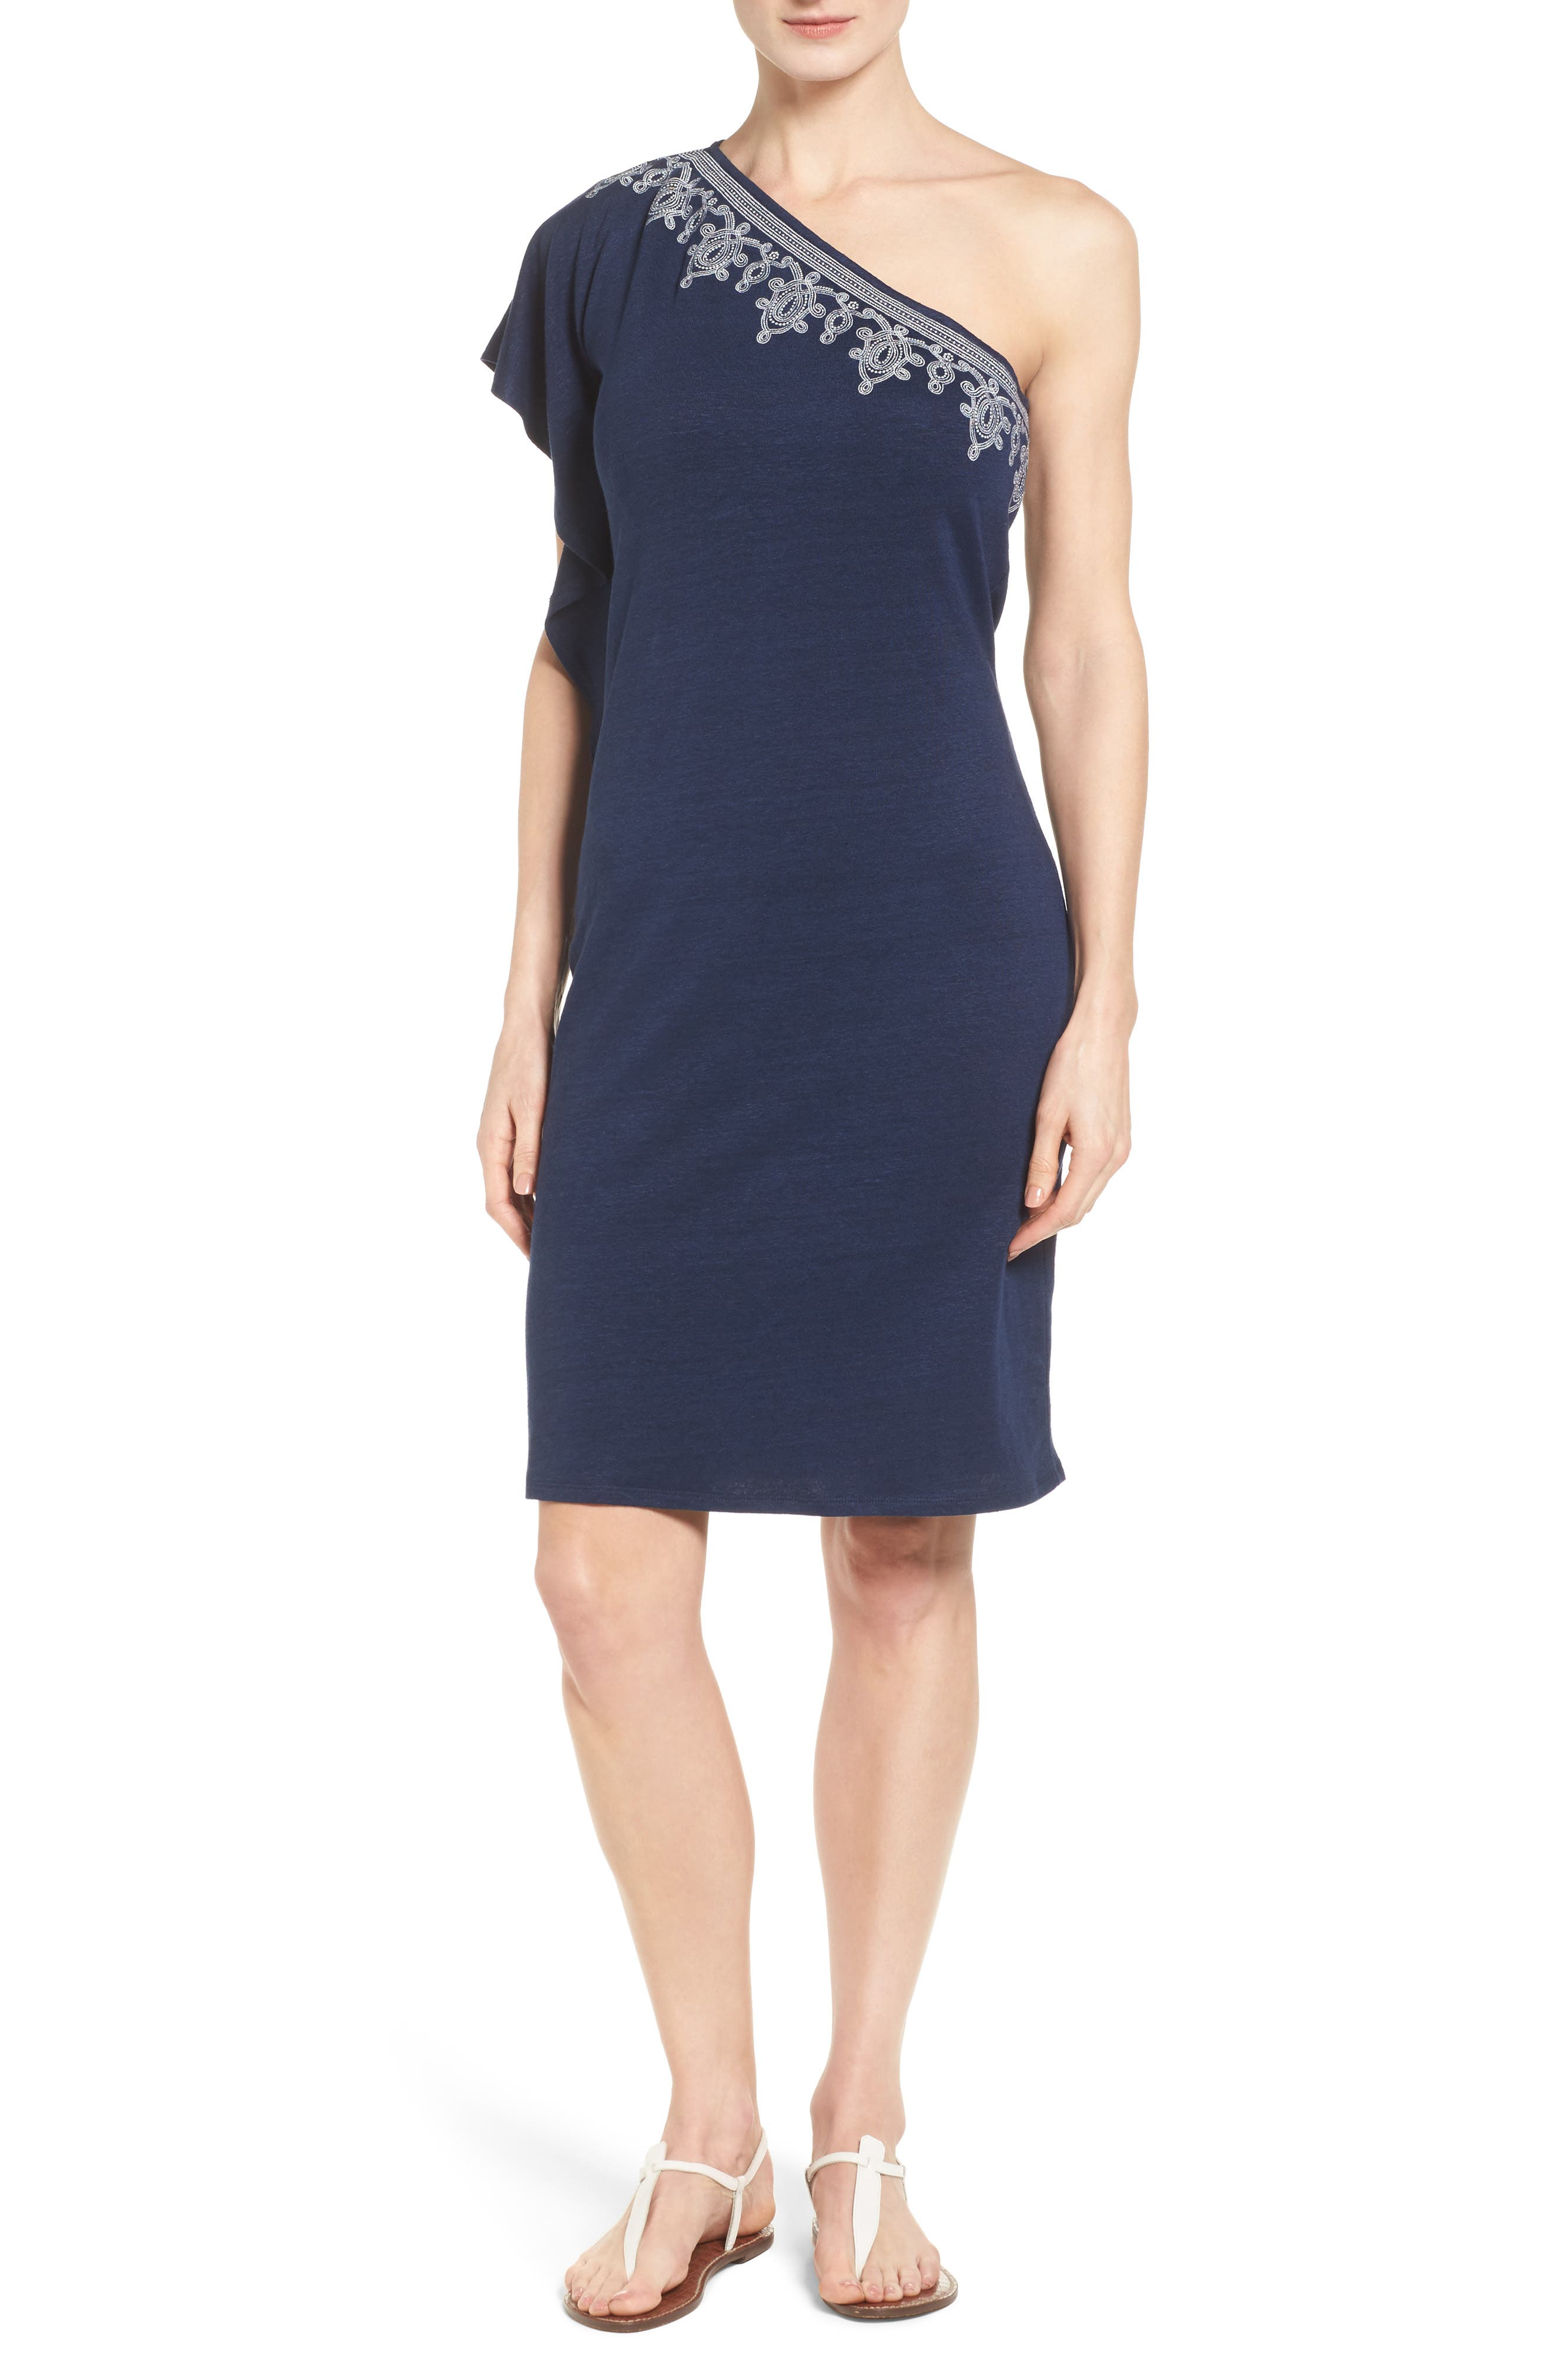 Lovelin One-Shoulder Dress,                         Main,                         color, Ocean Deep